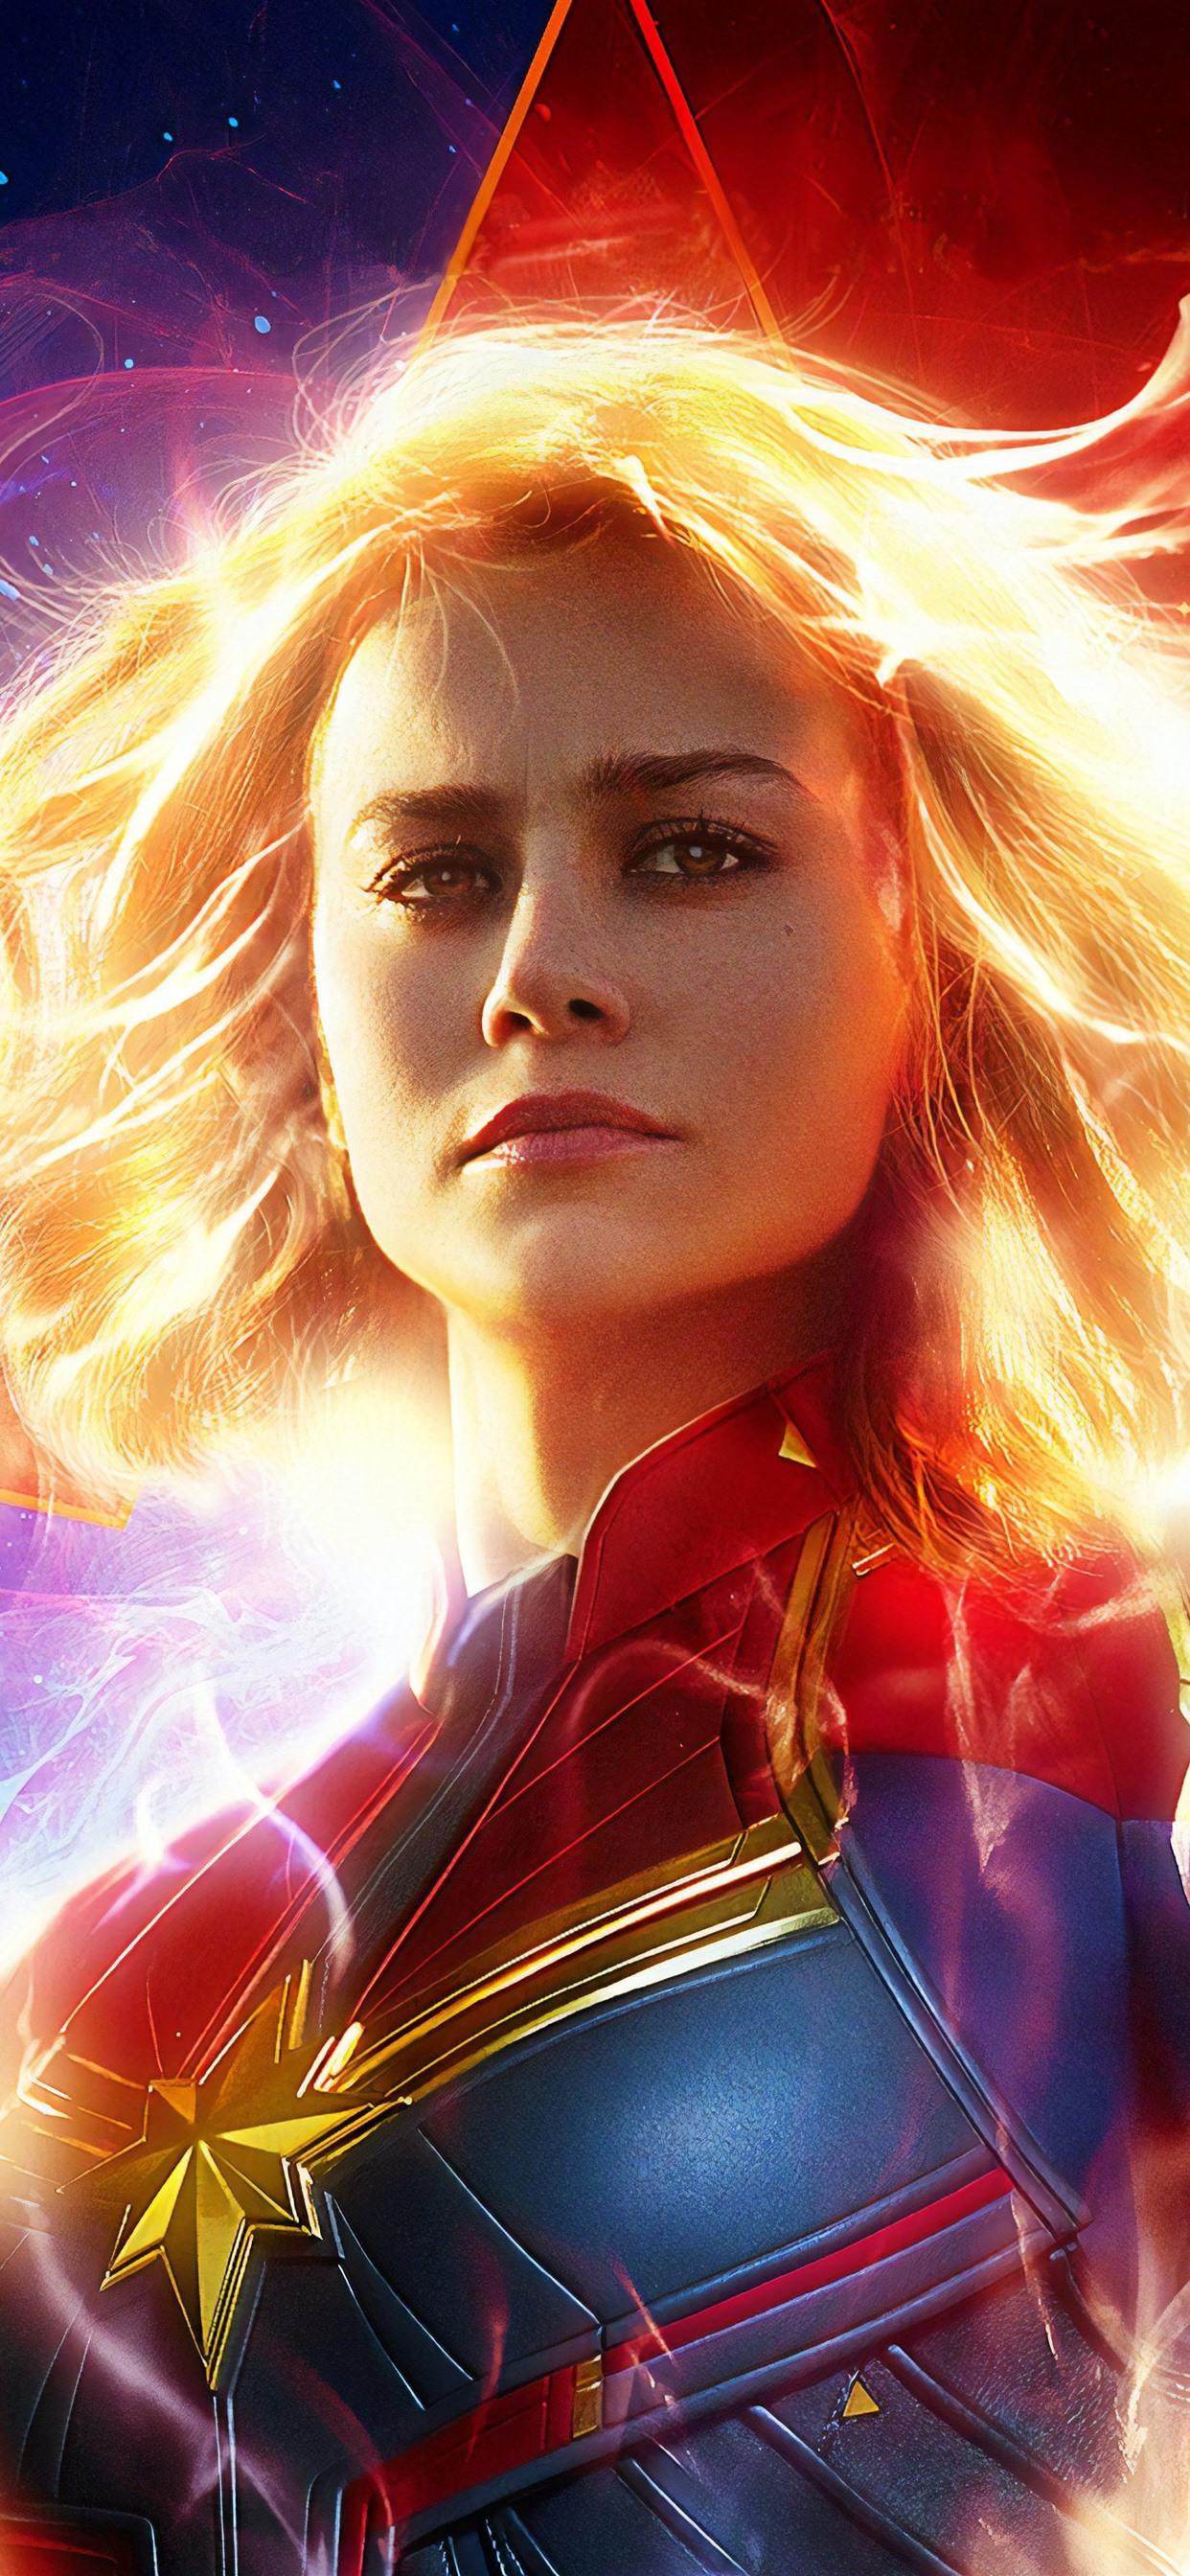 Iphone Xs Captain Marvel Backgrounds 1242x2688 Download Hd Wallpaper Wallpapertip